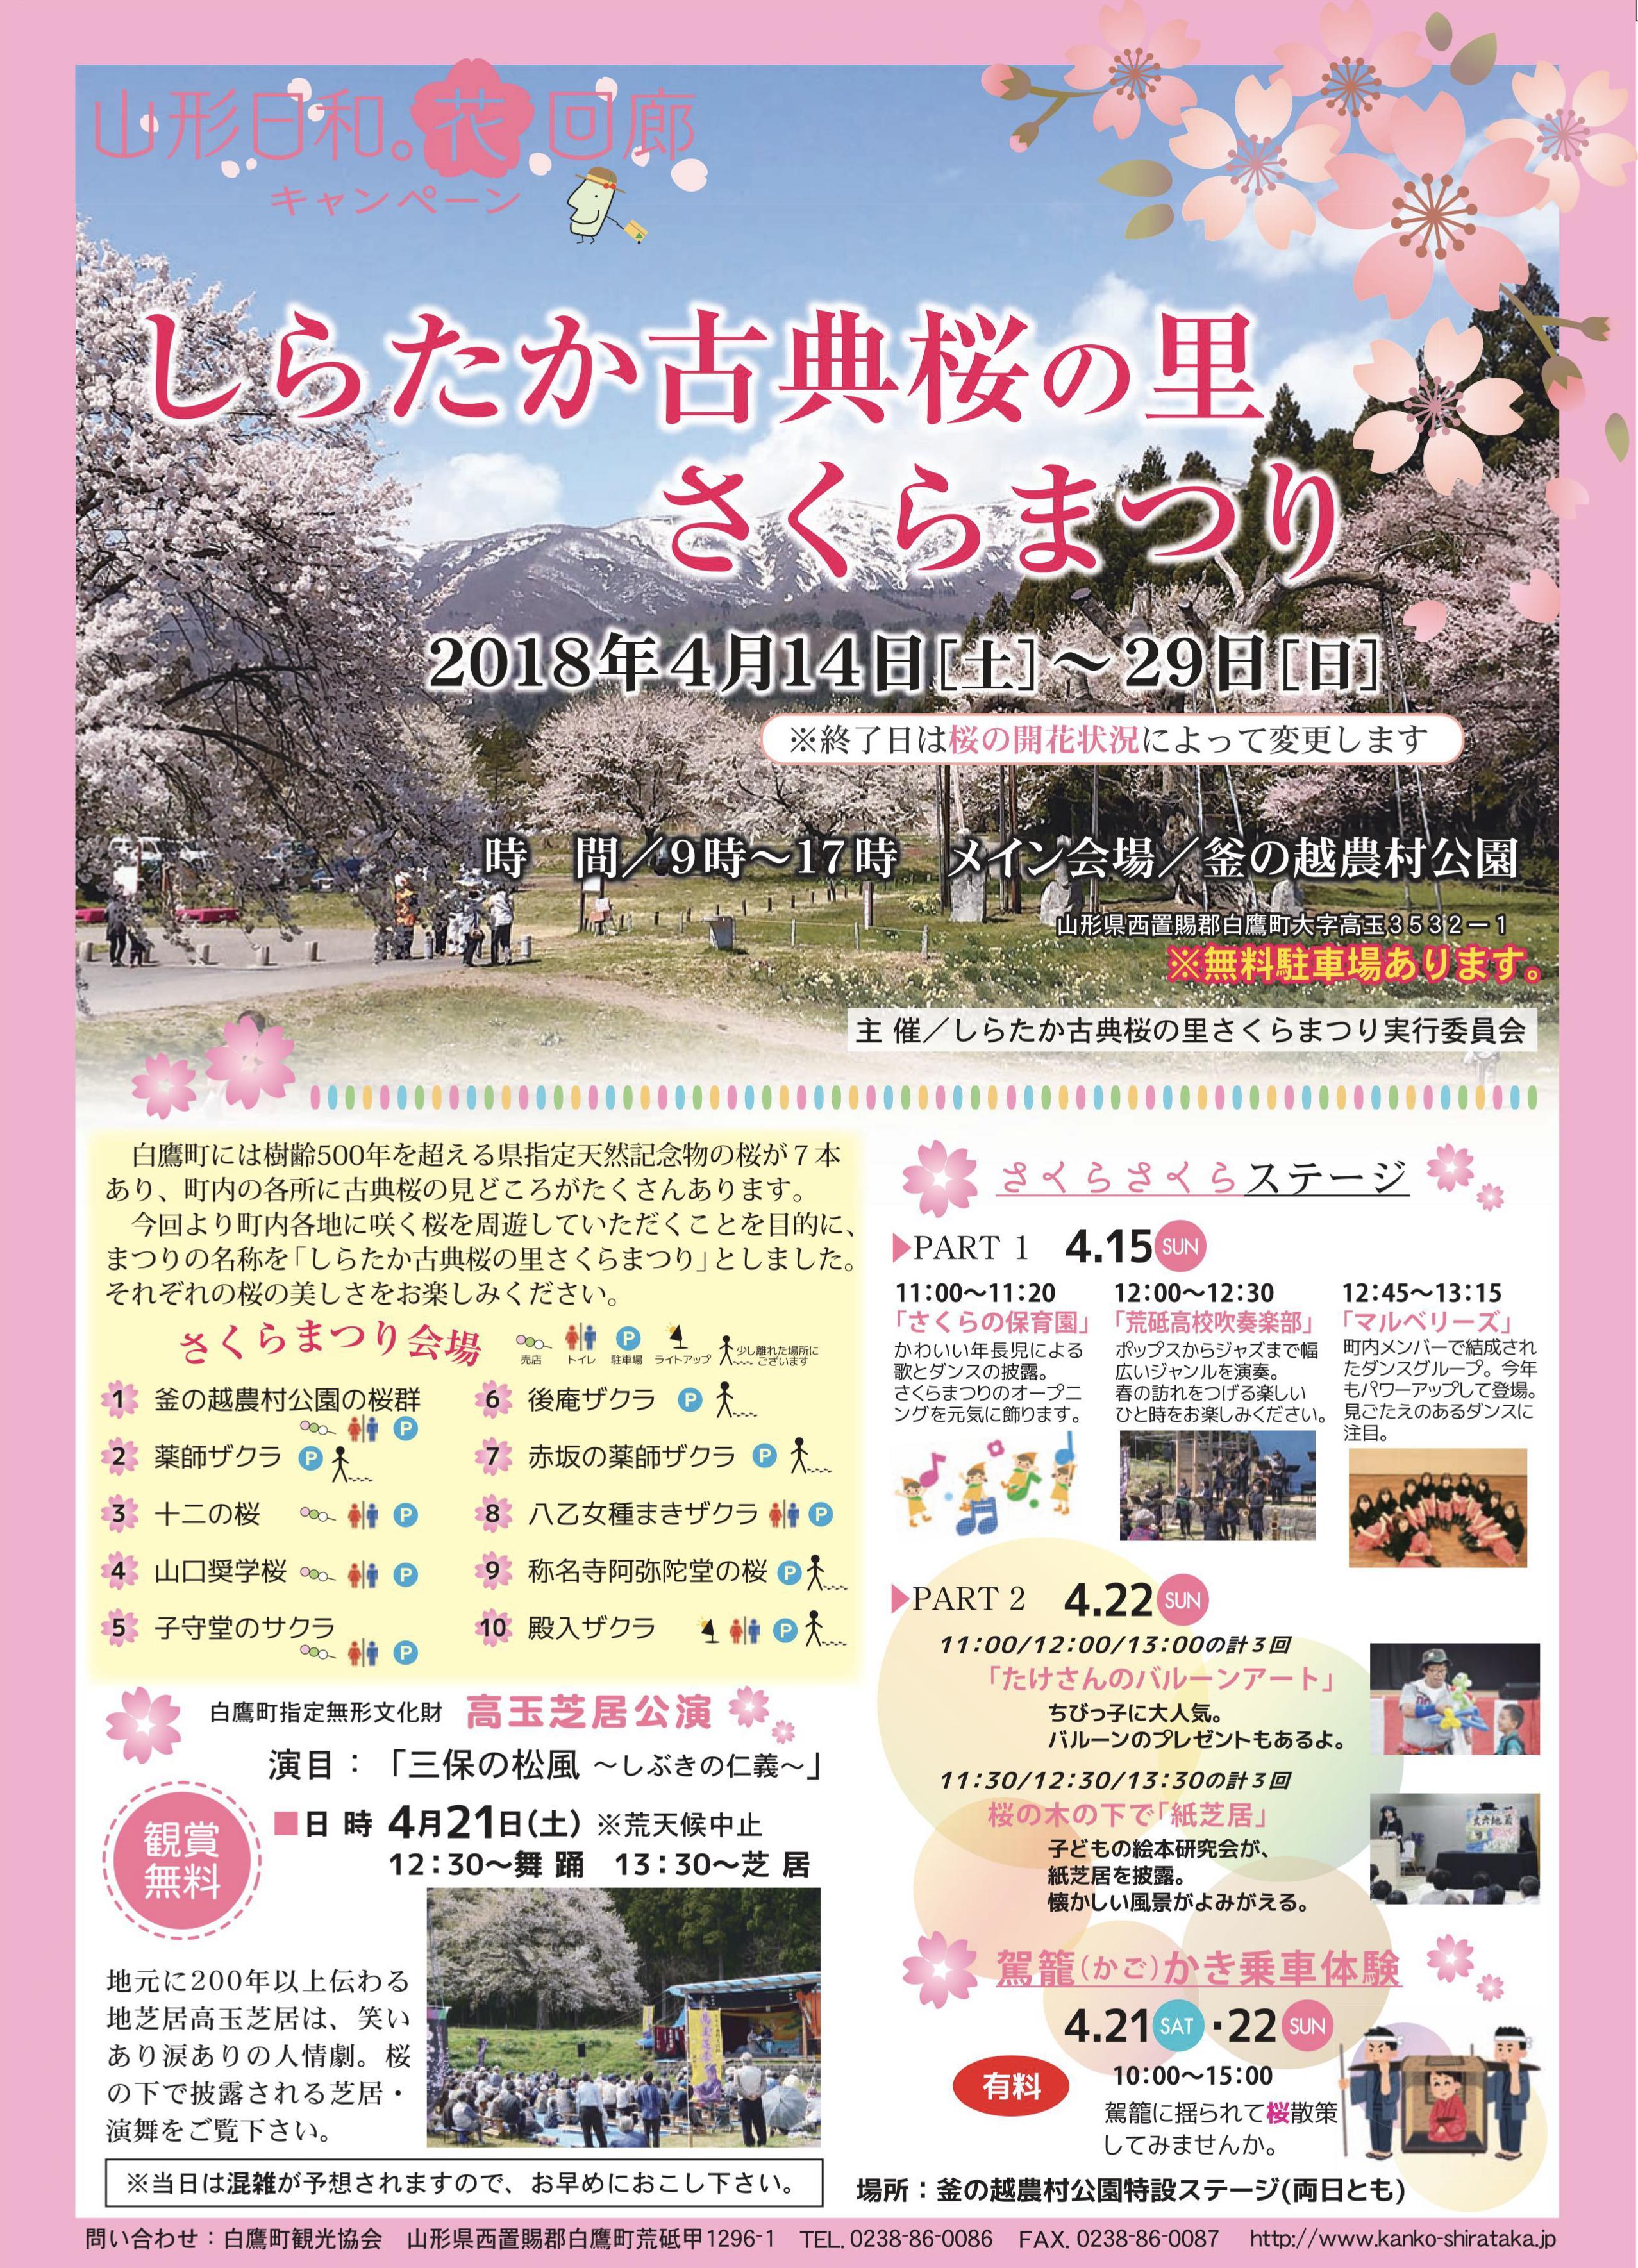 Village Cherry Blossom Festival of shirataka classic cherry tree: Image